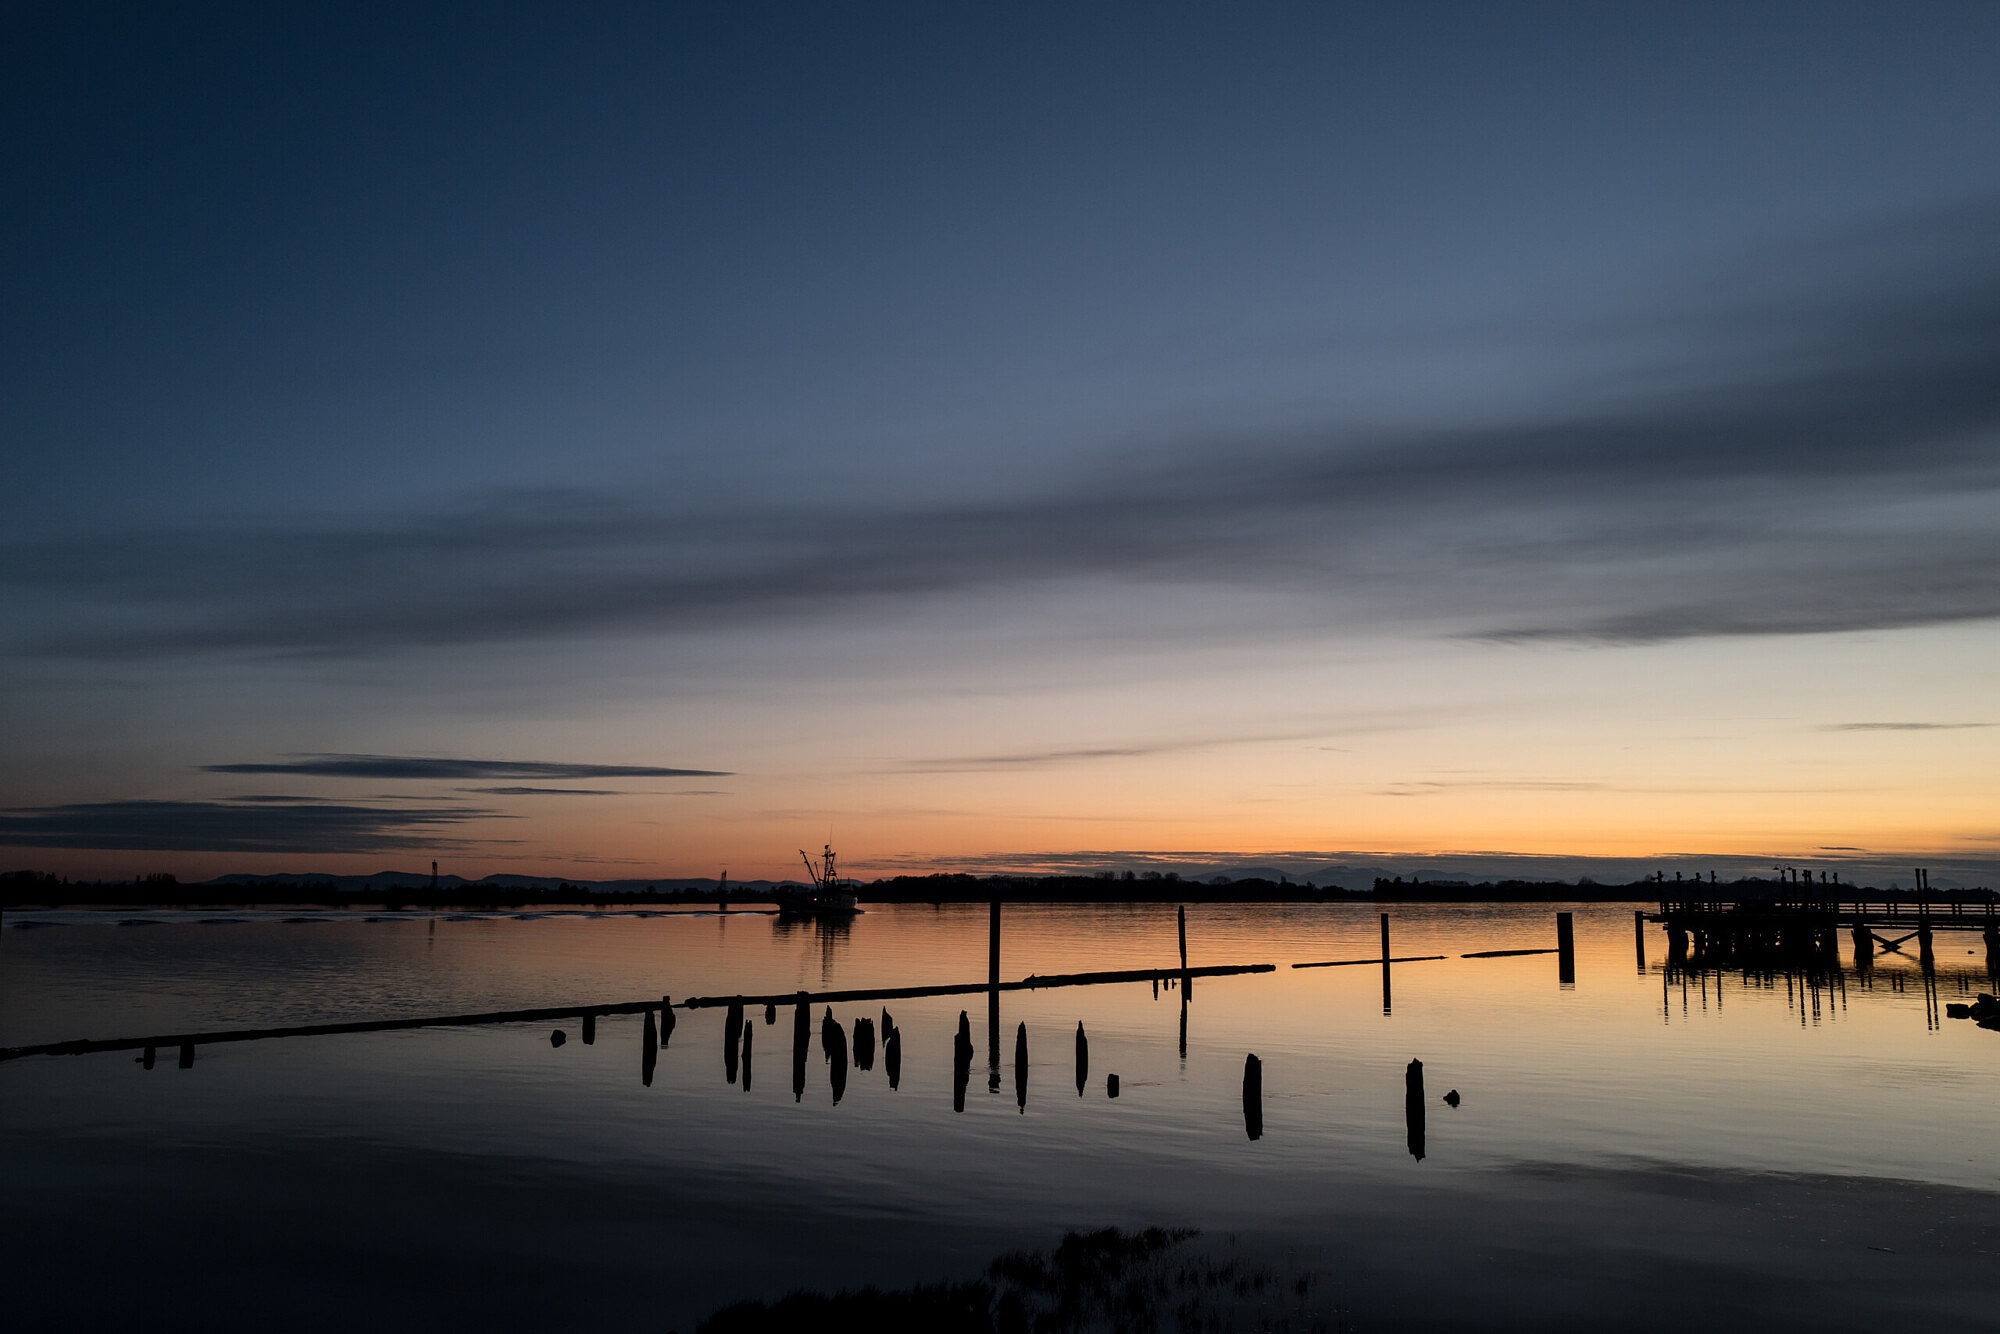 fishing-boat-returning-at-sunset